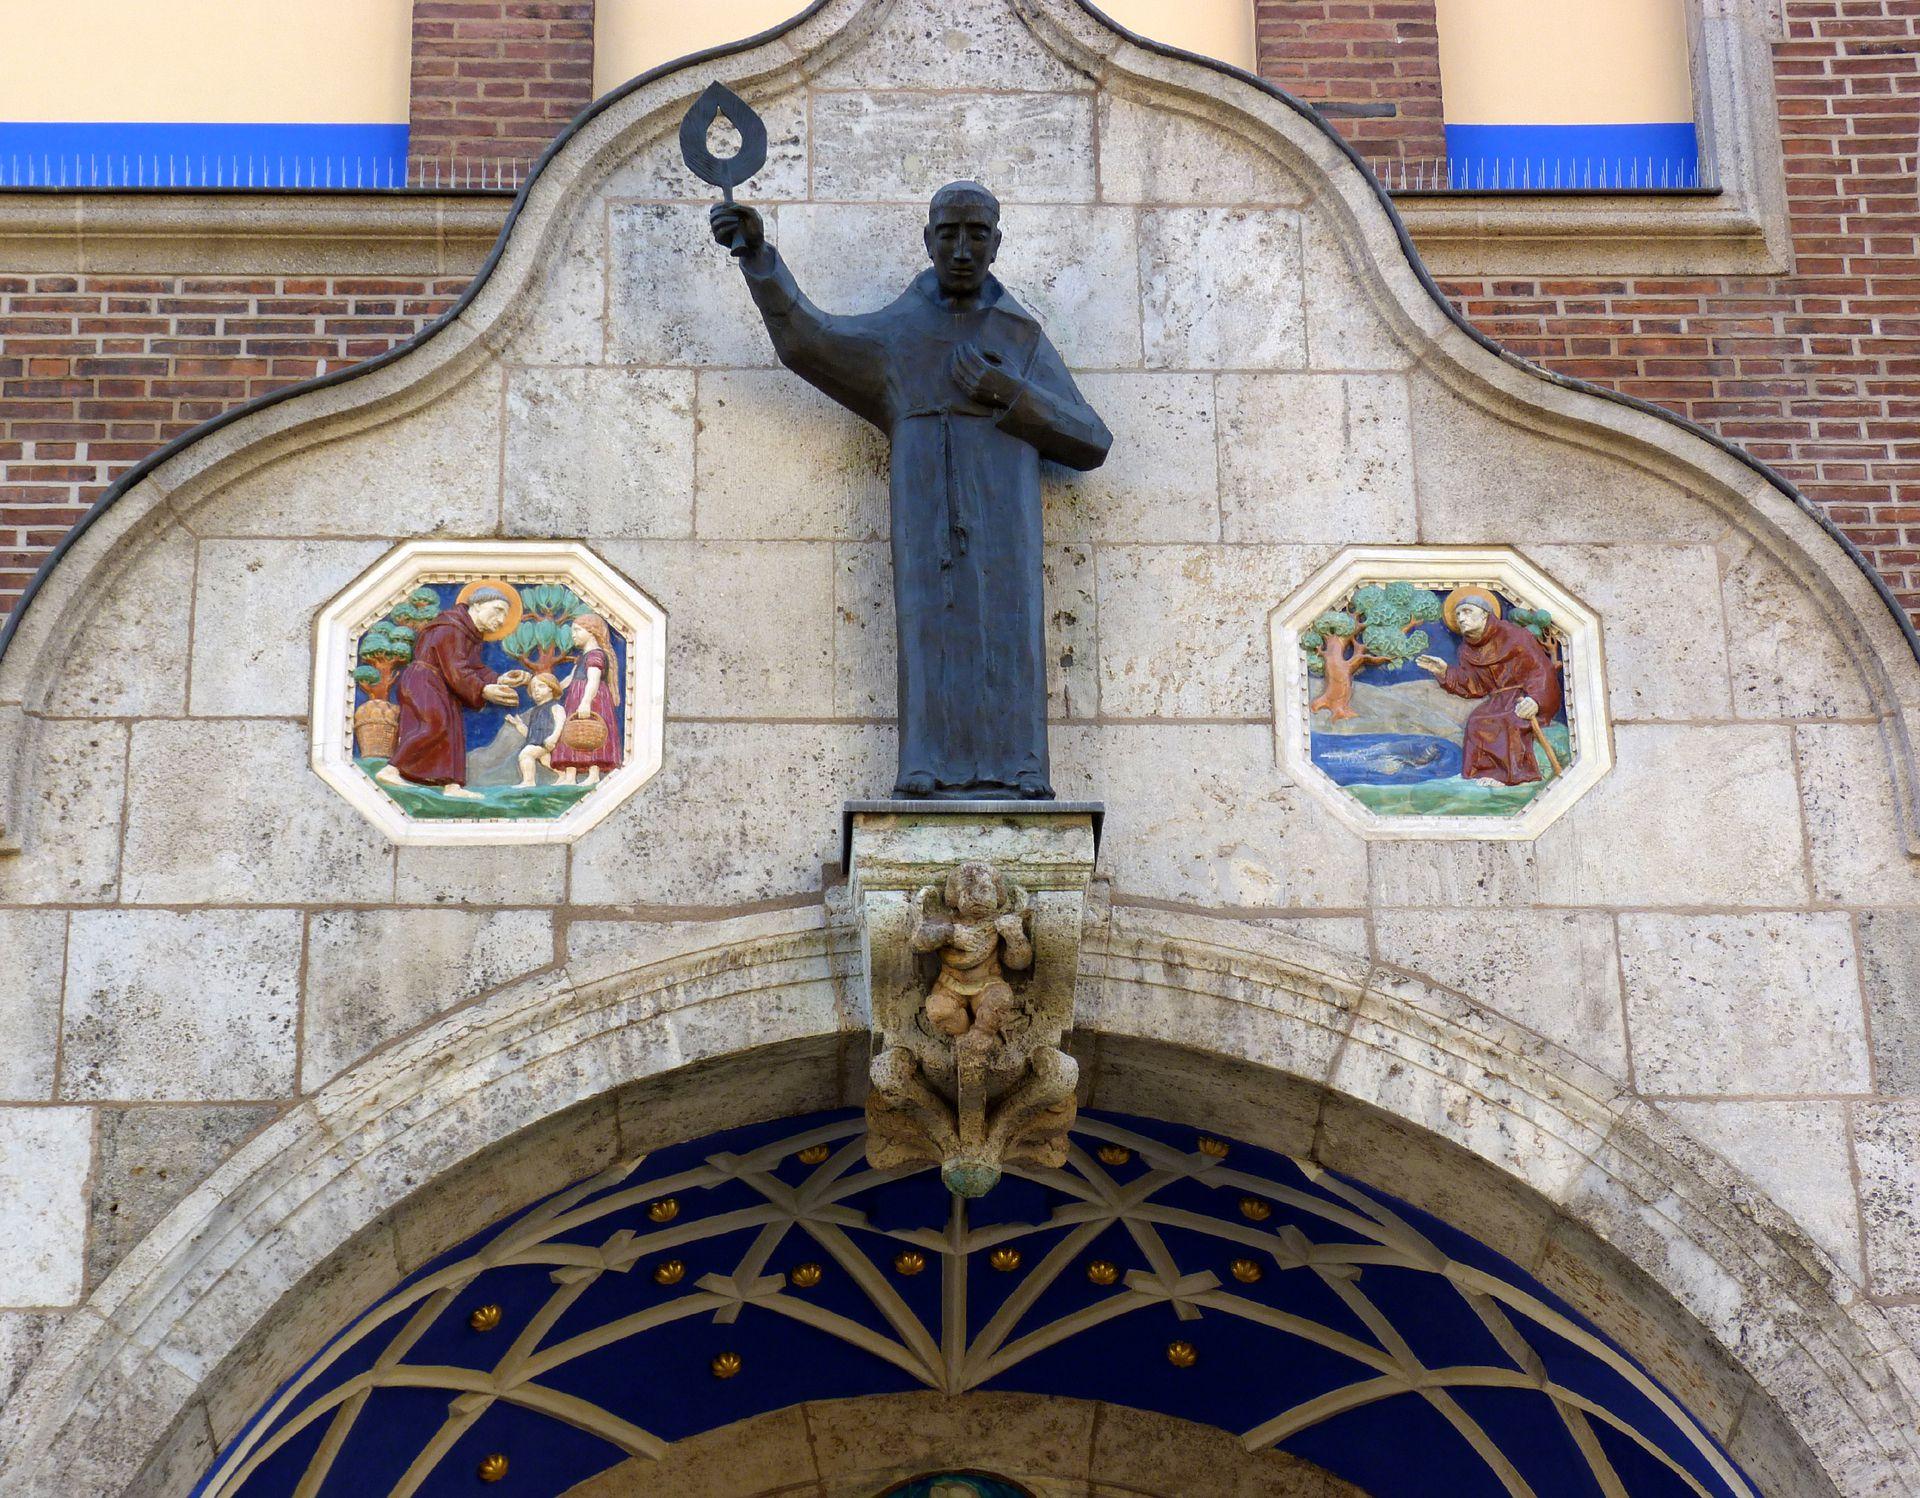 St. Anton Church Entrance hall, curved pediment